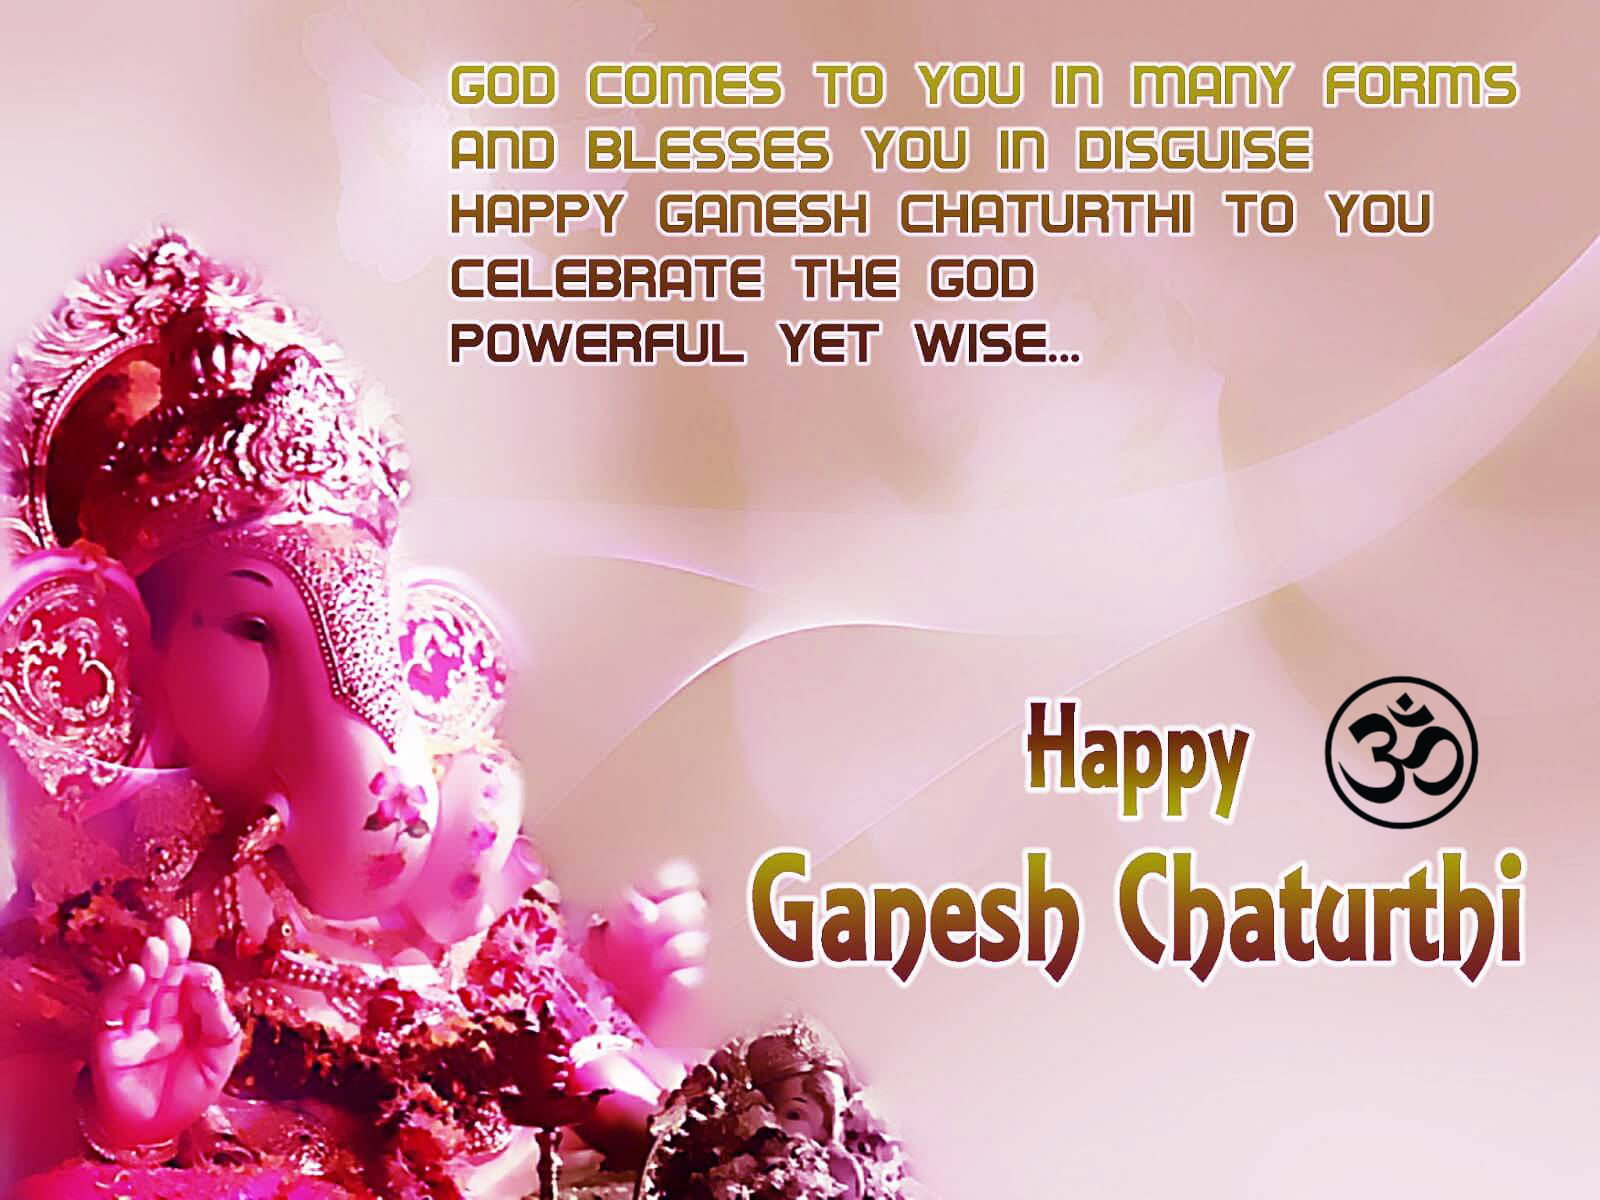 Ganesh chaturthi wishes images gifs wallpapers photos pics whatsapp status 2019, trending gyan